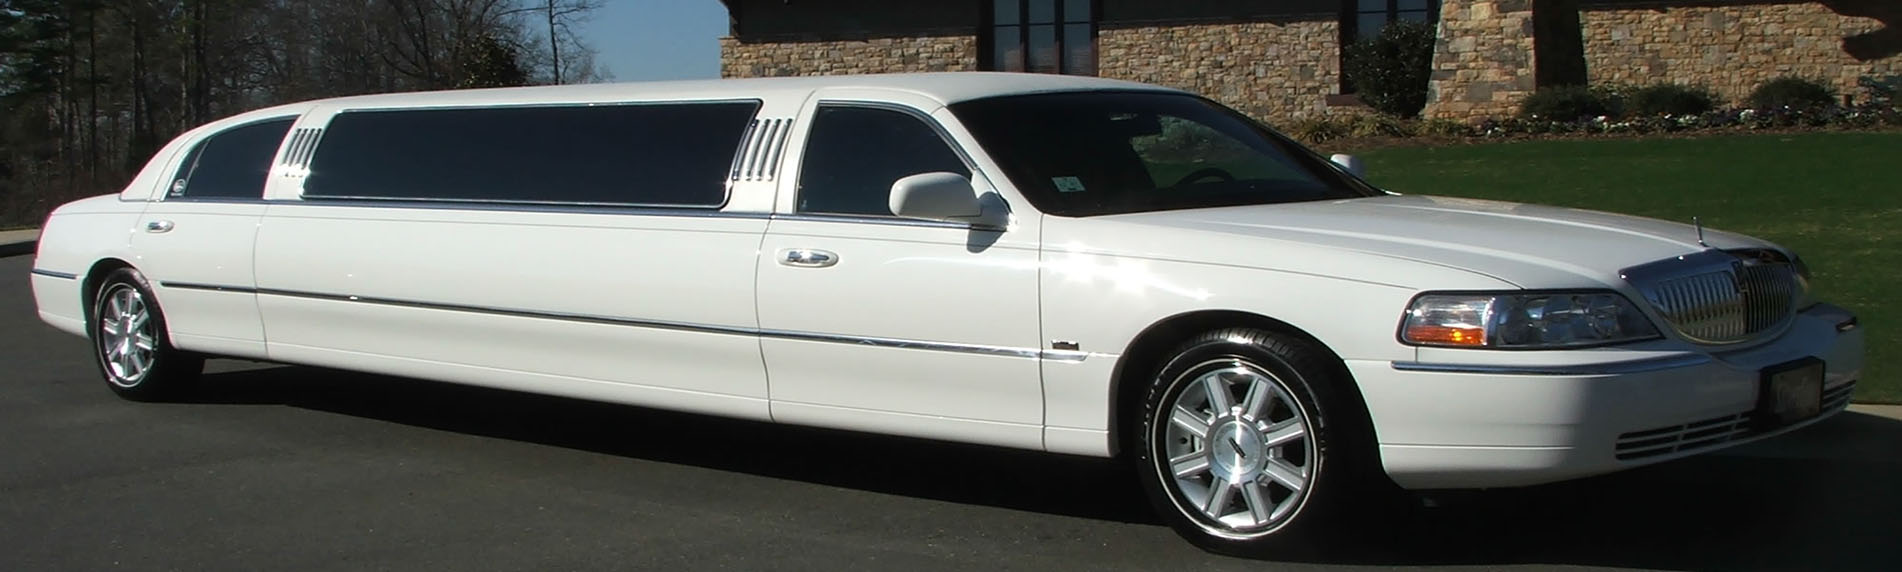 8-10 Passenger White Limousines